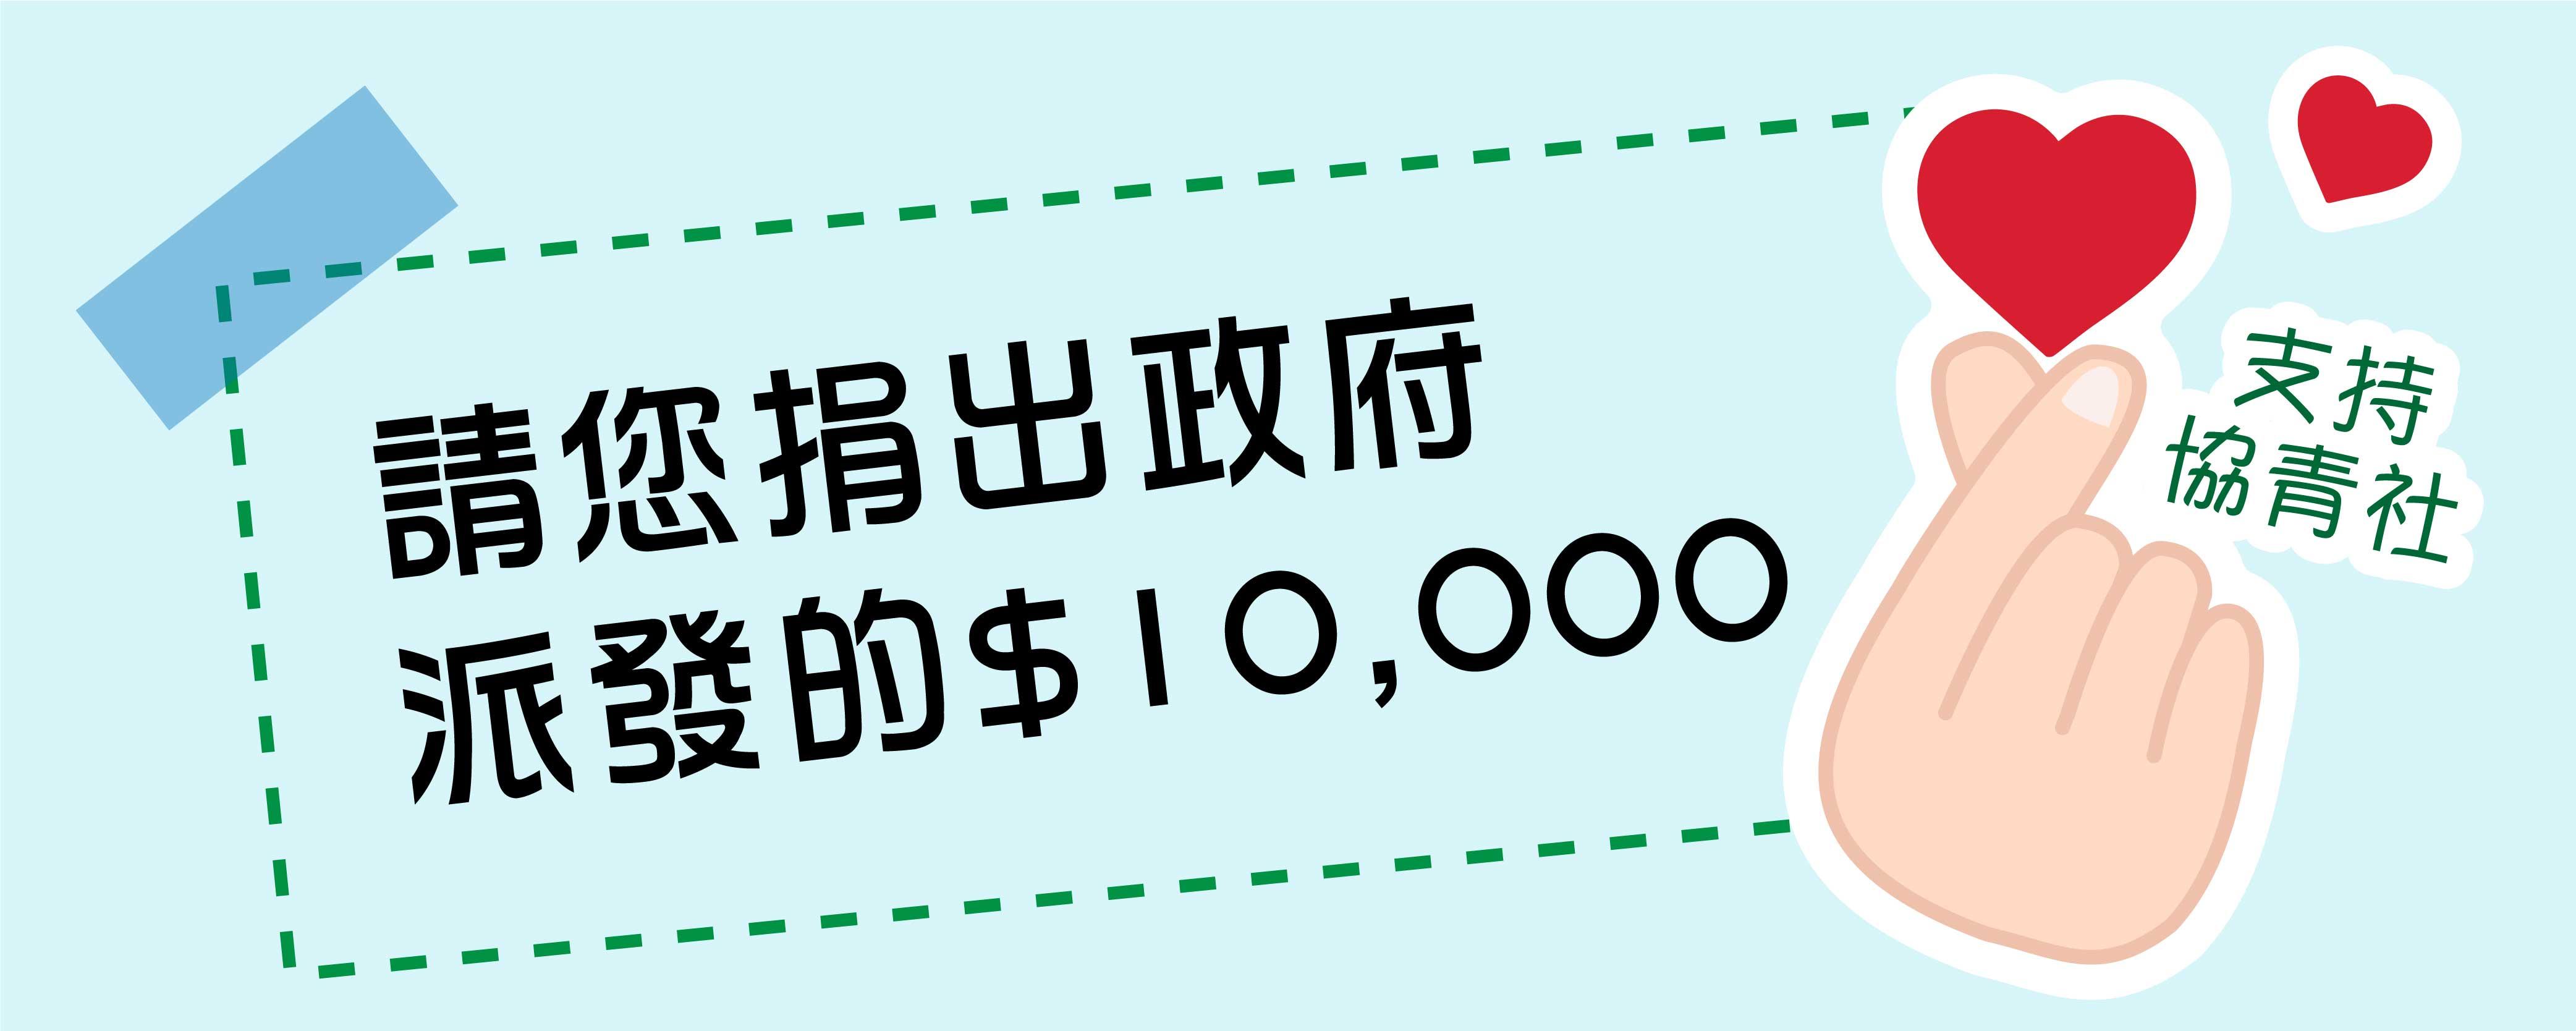 10000-plan_web-banner_10000-paln_10000x400.jpg (237 KB)